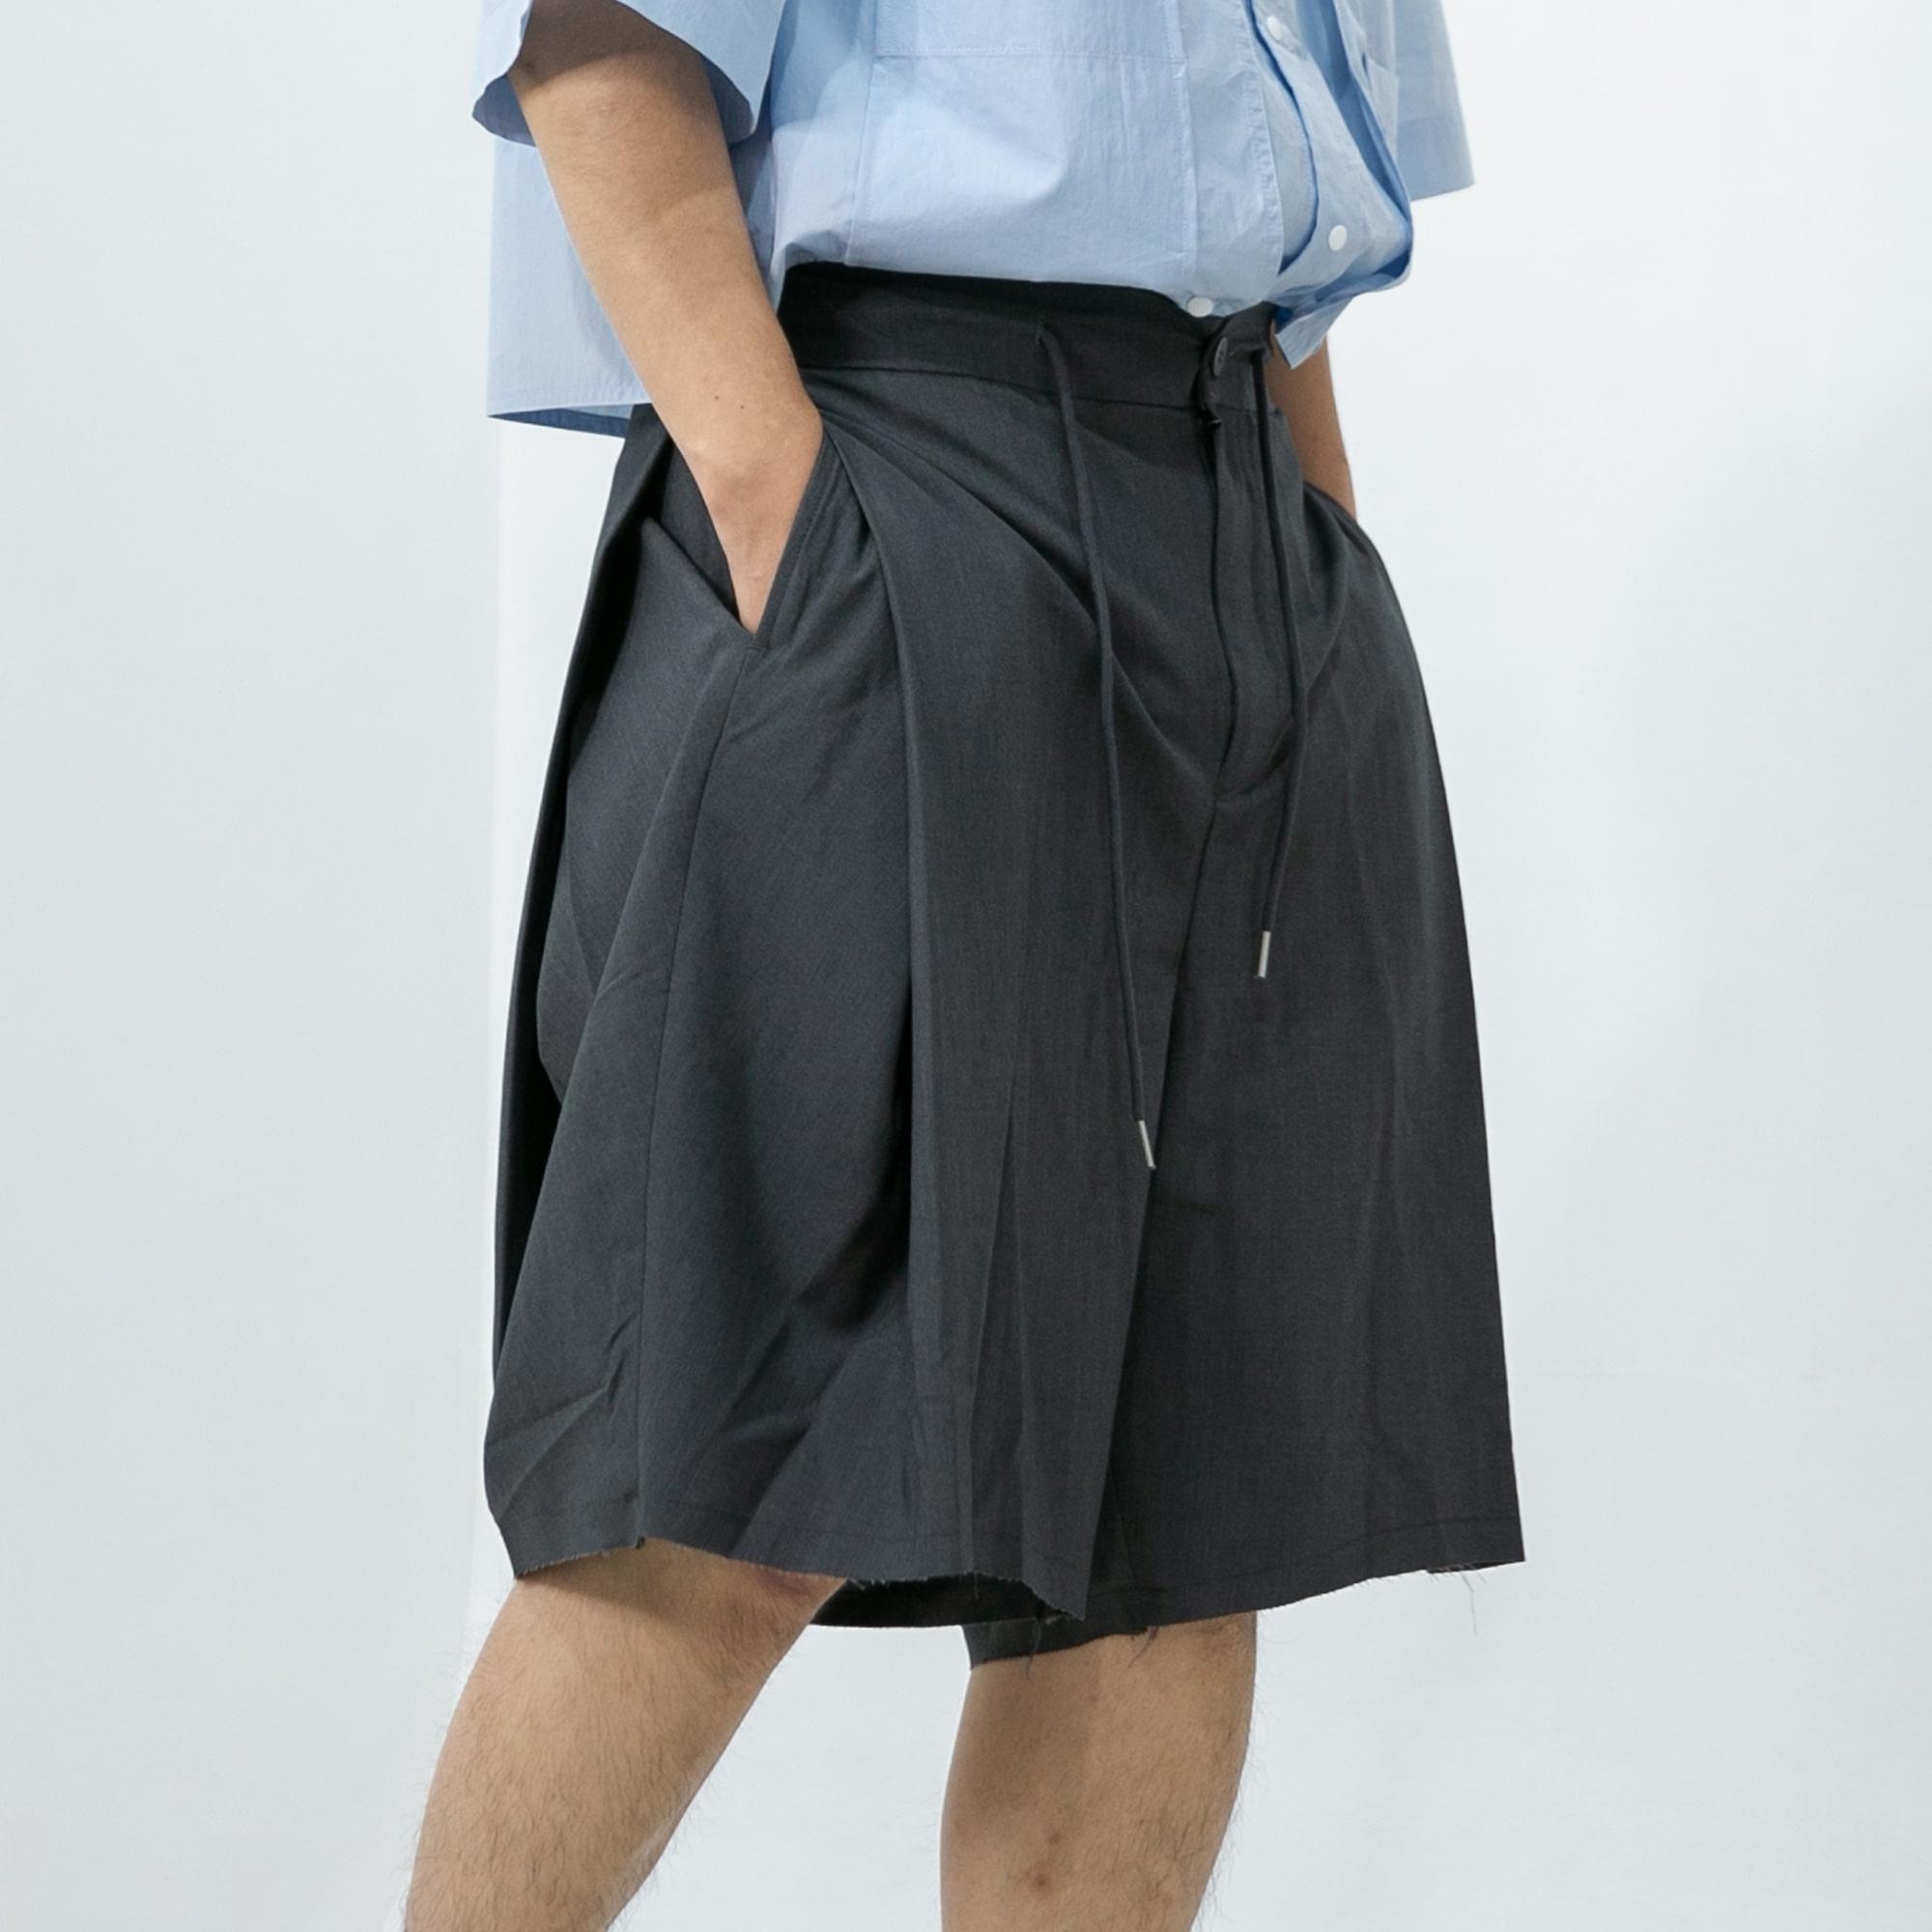 Oblique Skirt Half Pants - Grey